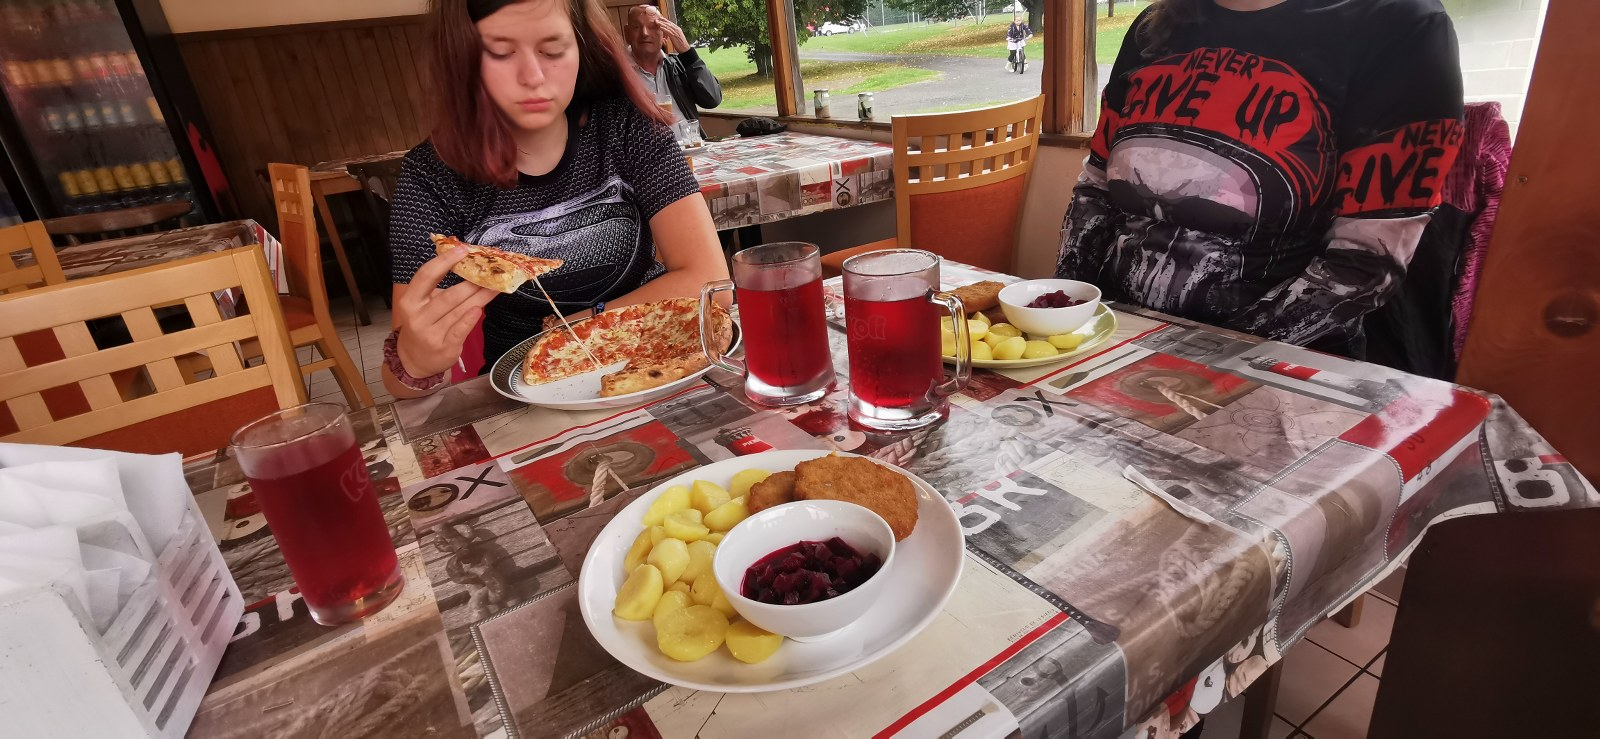 https://www.kempy-chaty.cz/sites/default/files/turistika/141_-_obed_v_restauraci.jpg